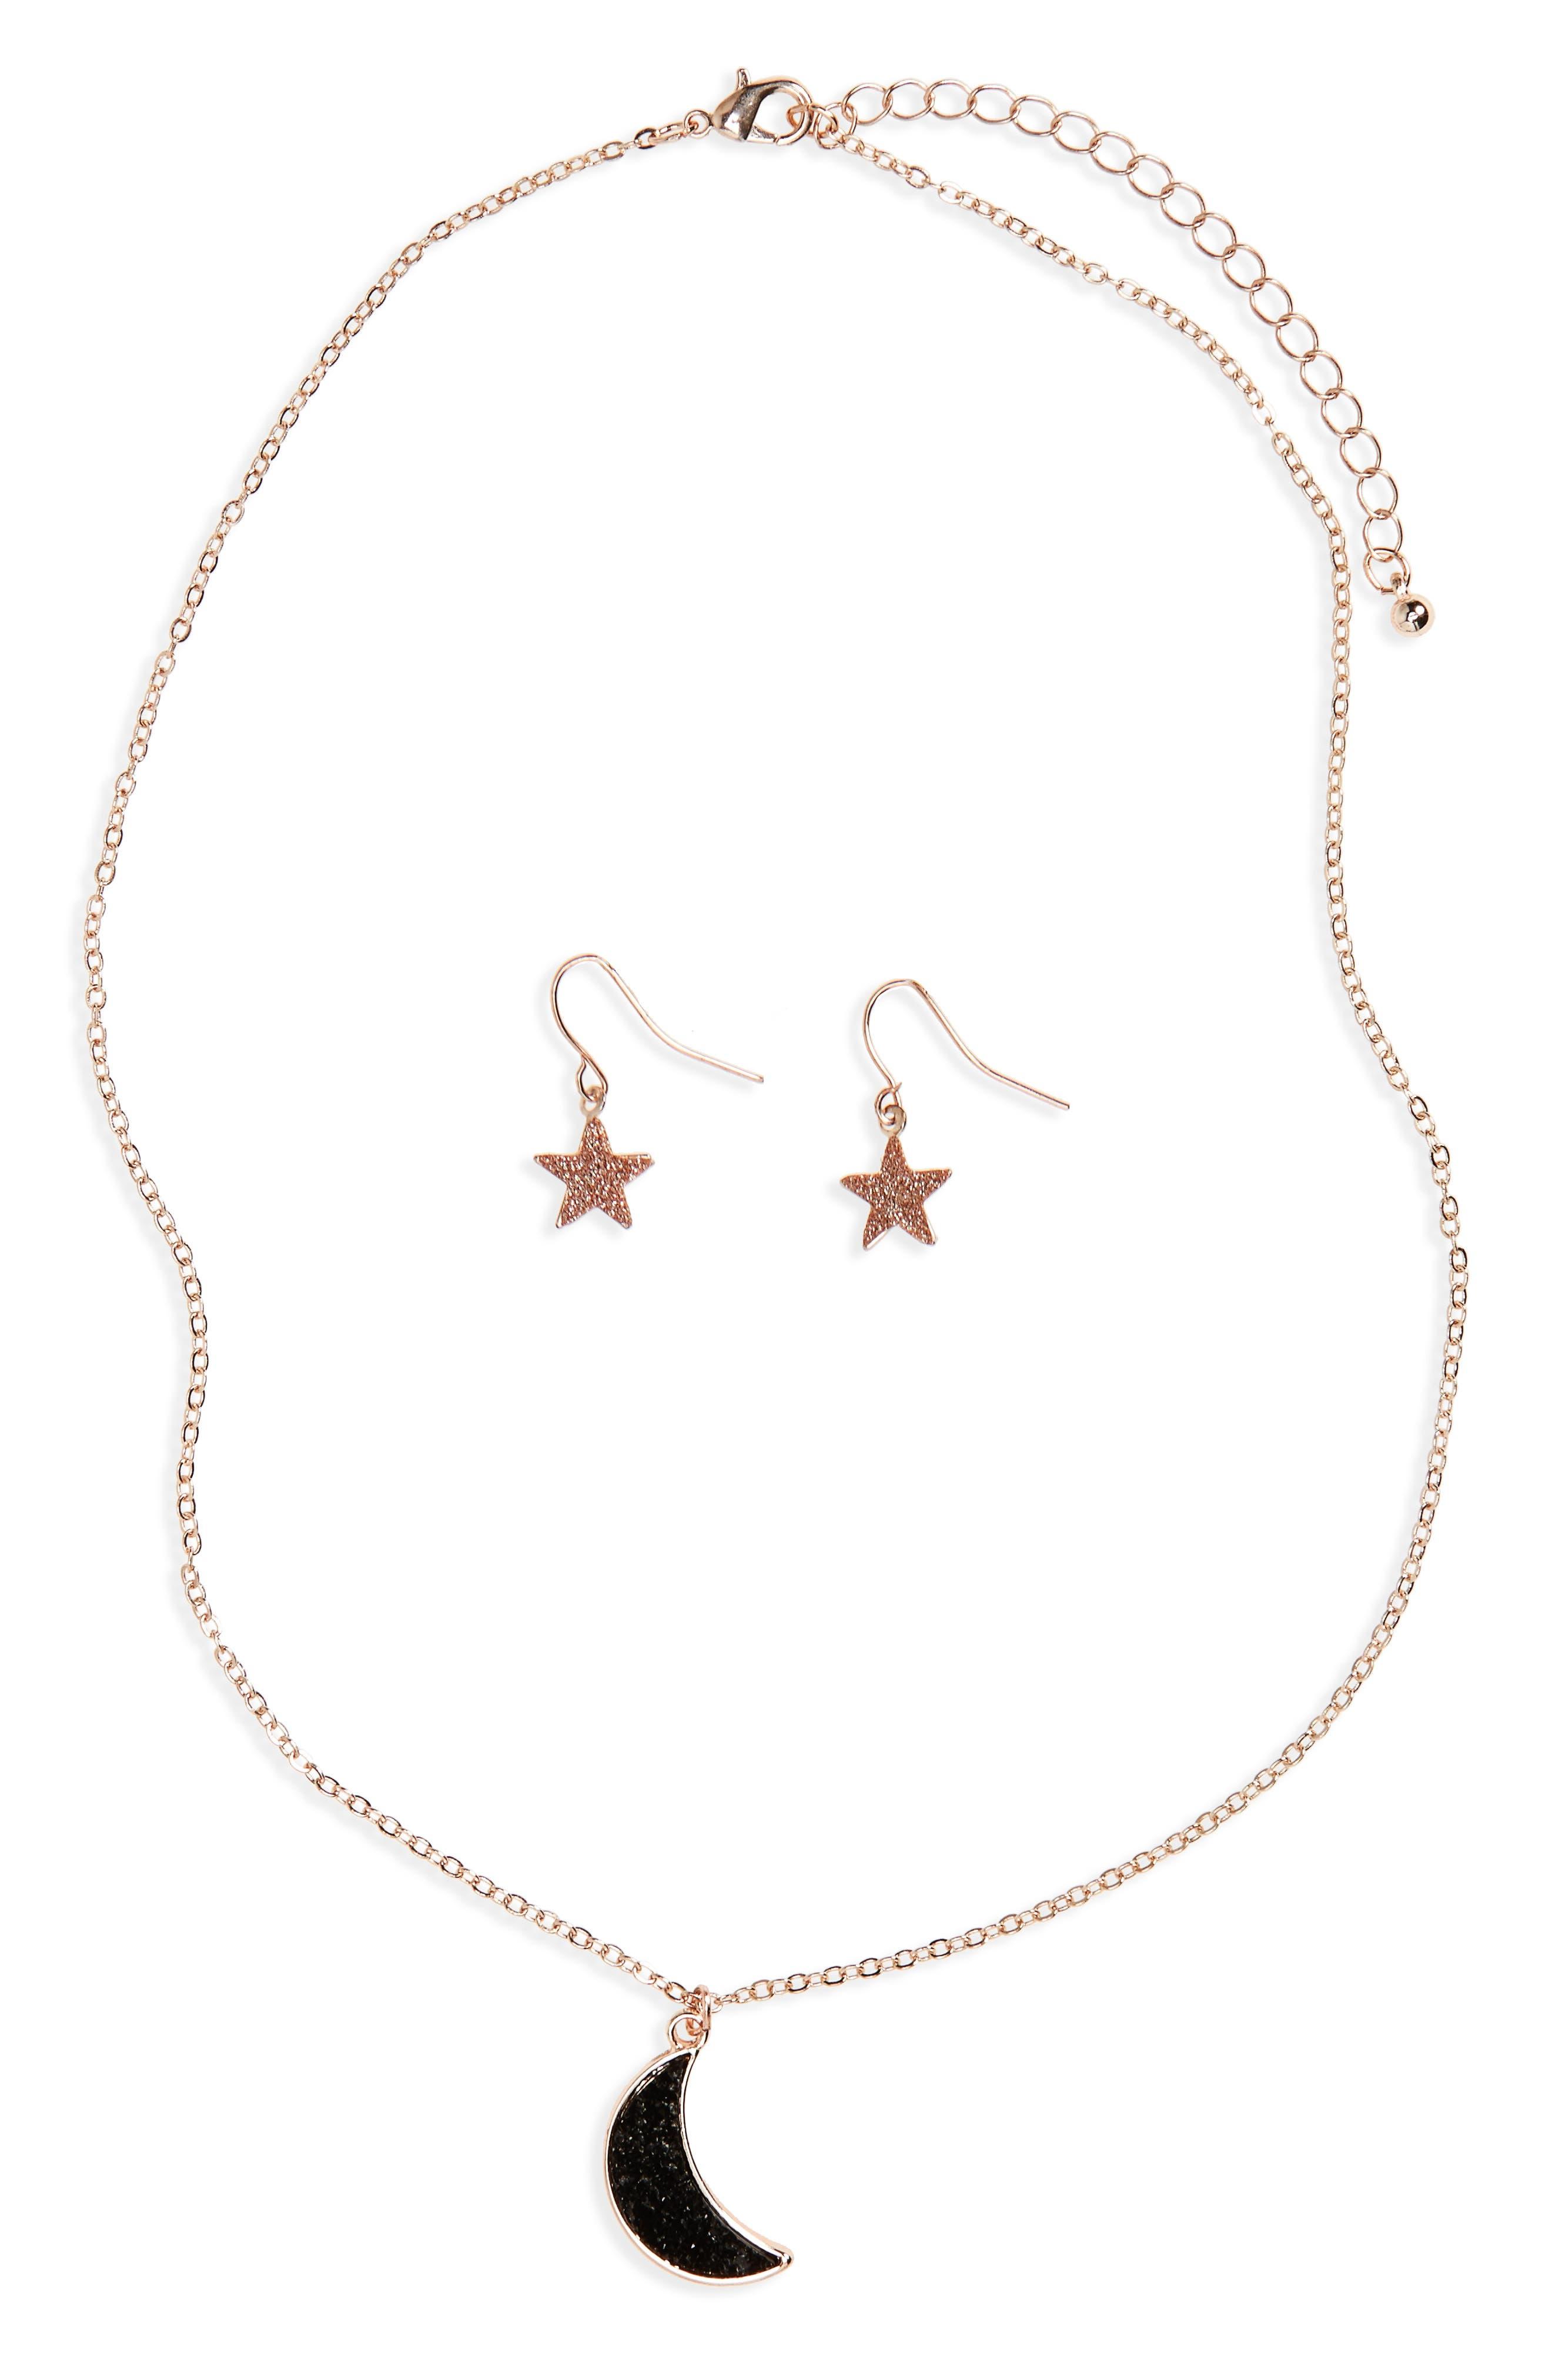 Wonderland Moon Necklace & Star Earrings Set,                             Main thumbnail 1, color,